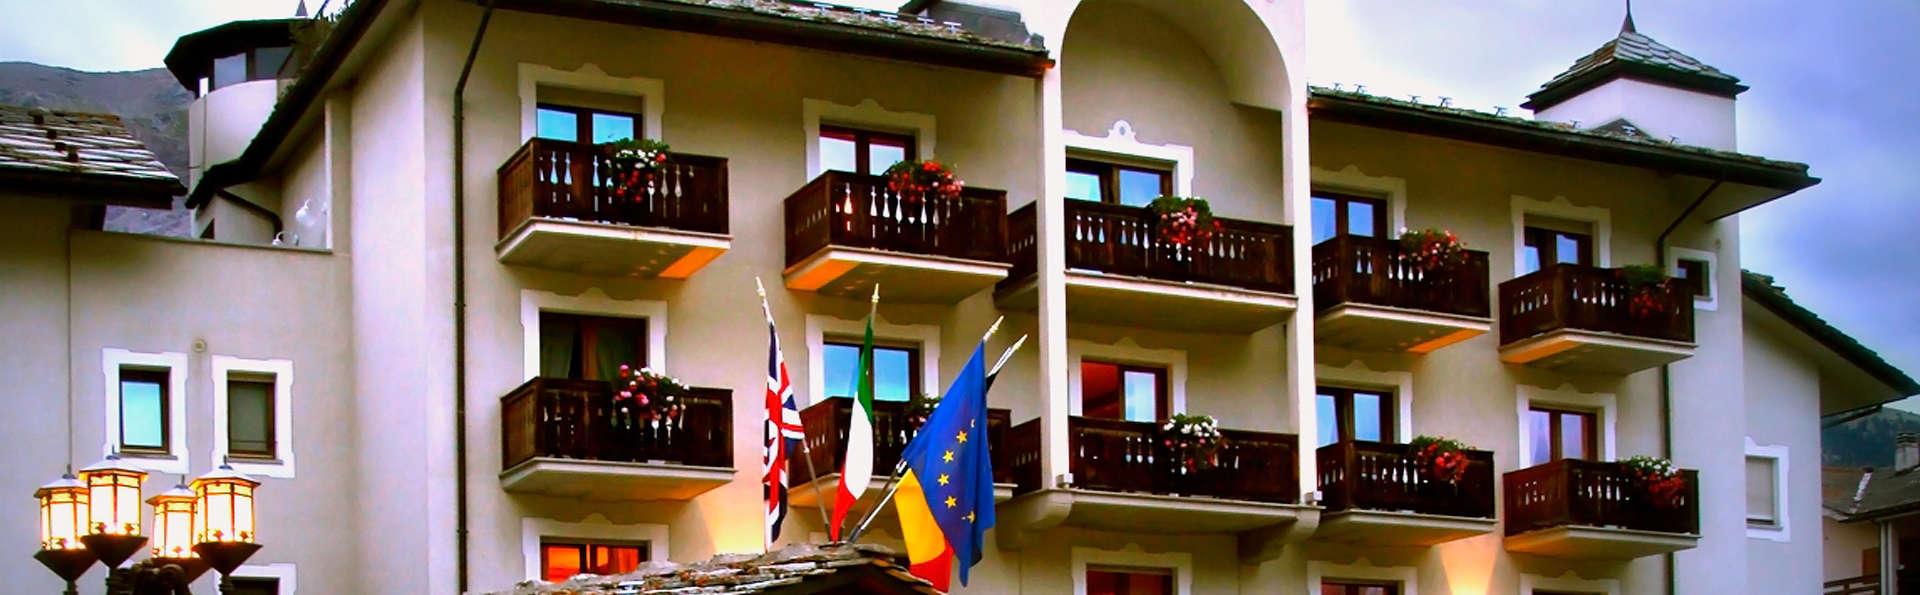 Hotel Miramonti - edit_front1.jpg